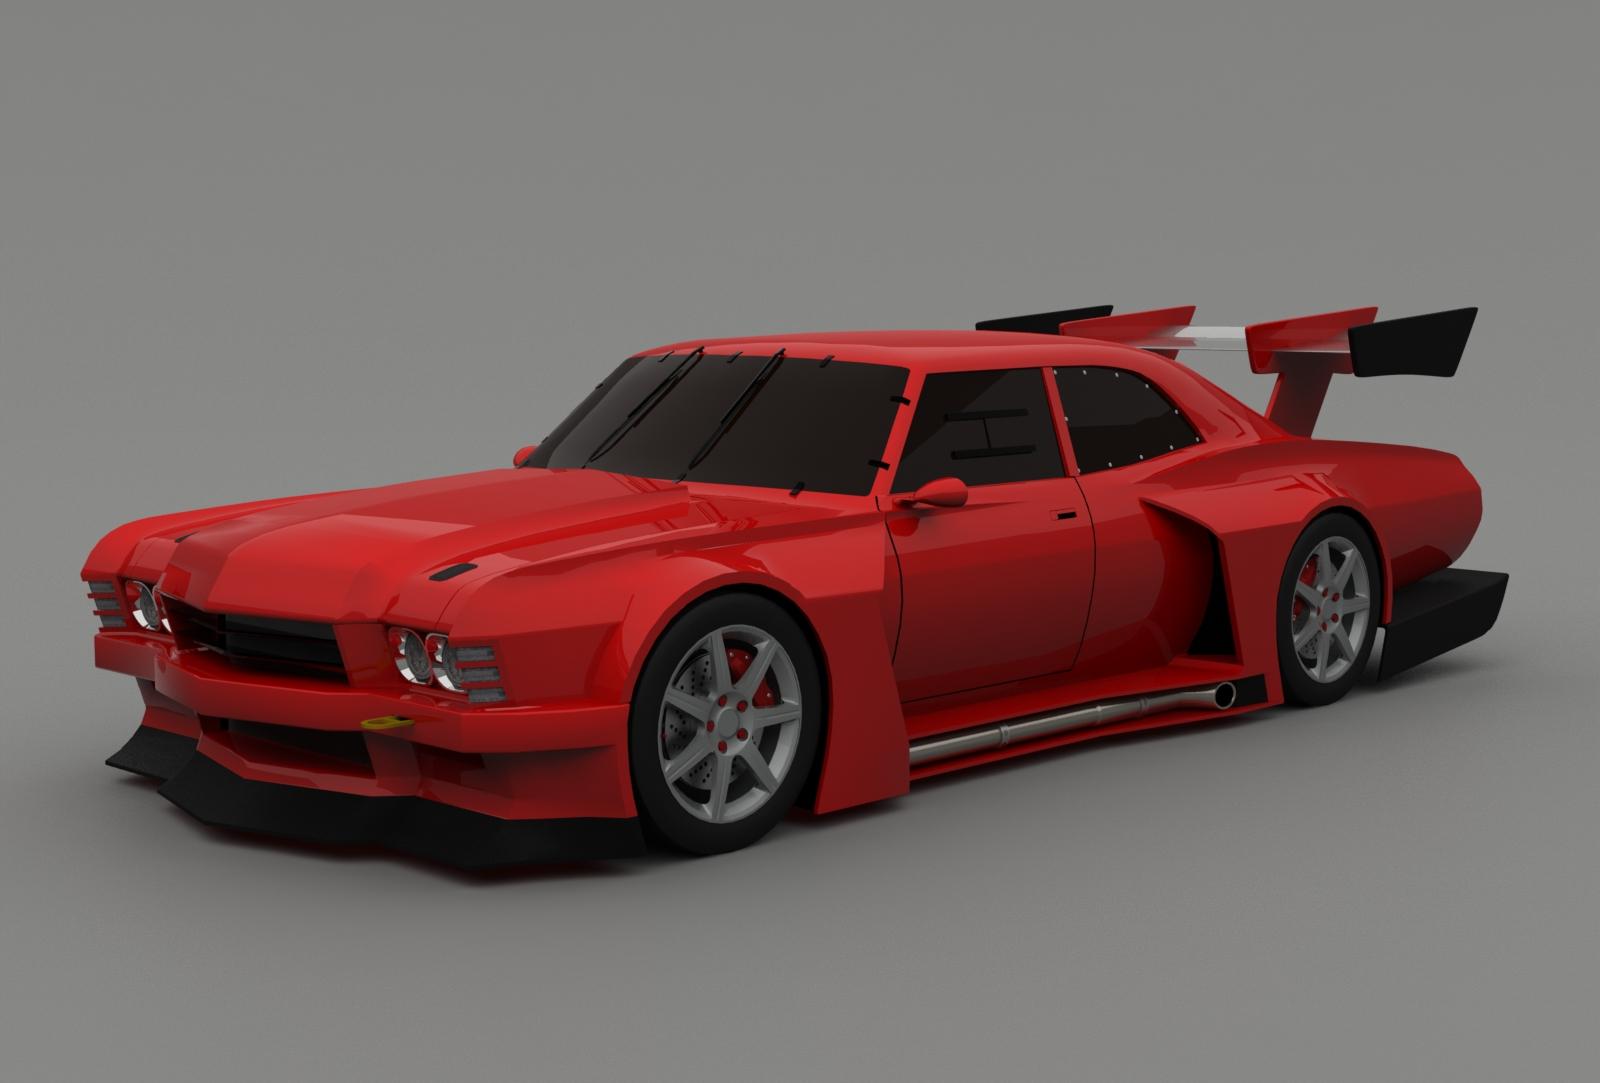 2013-03_The Crew_F.Beudin_Chevrolet Impala-1967-Racing2 Design_02